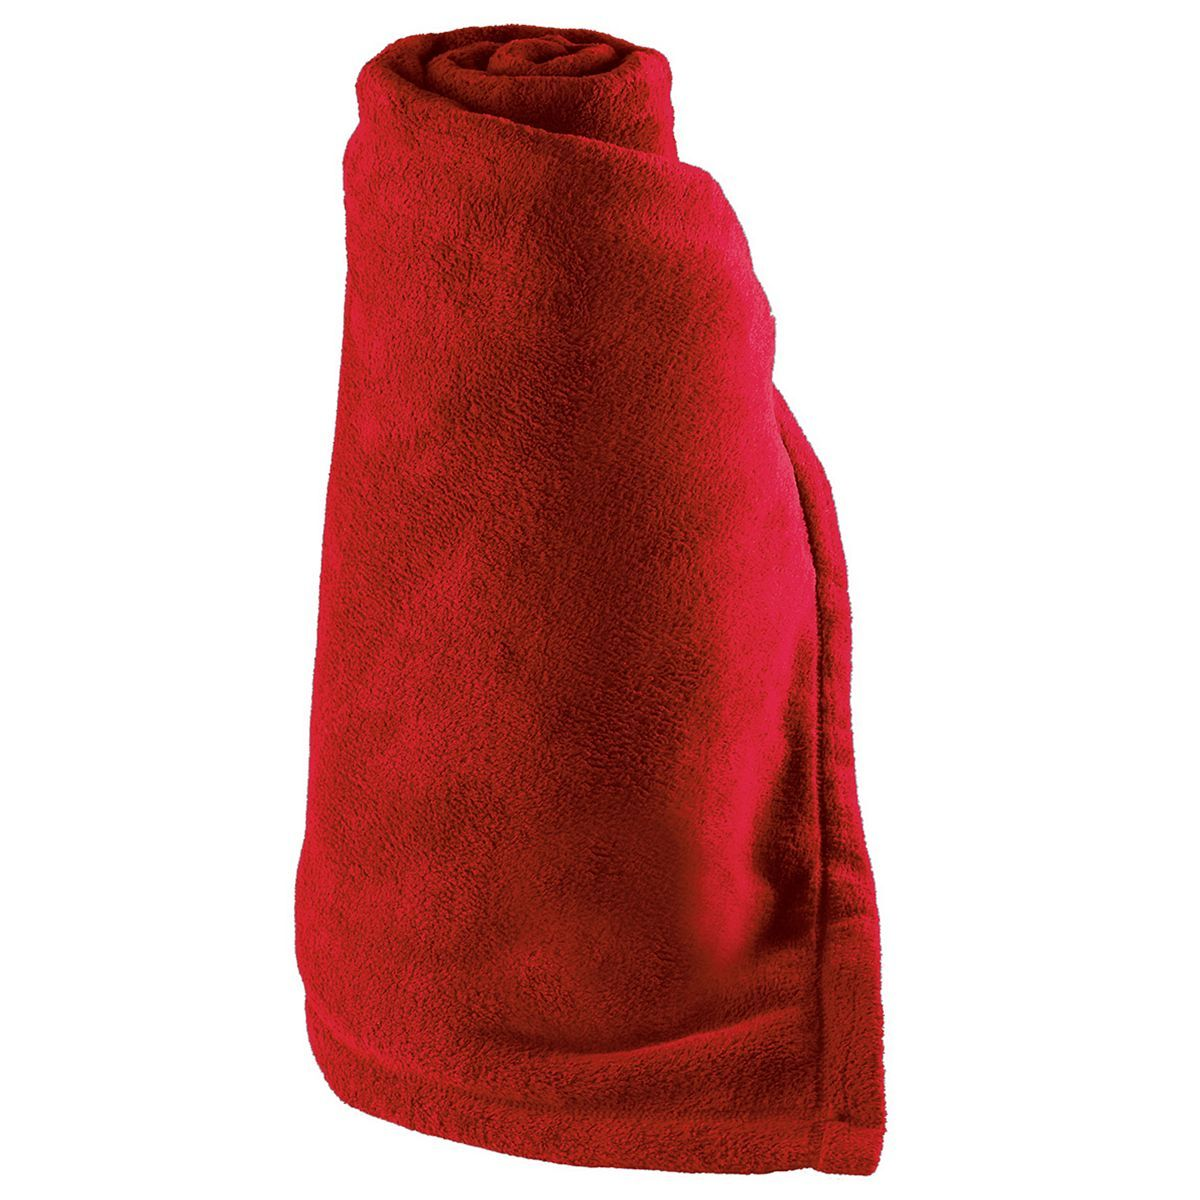 Tailgate Blanket - SCARLET